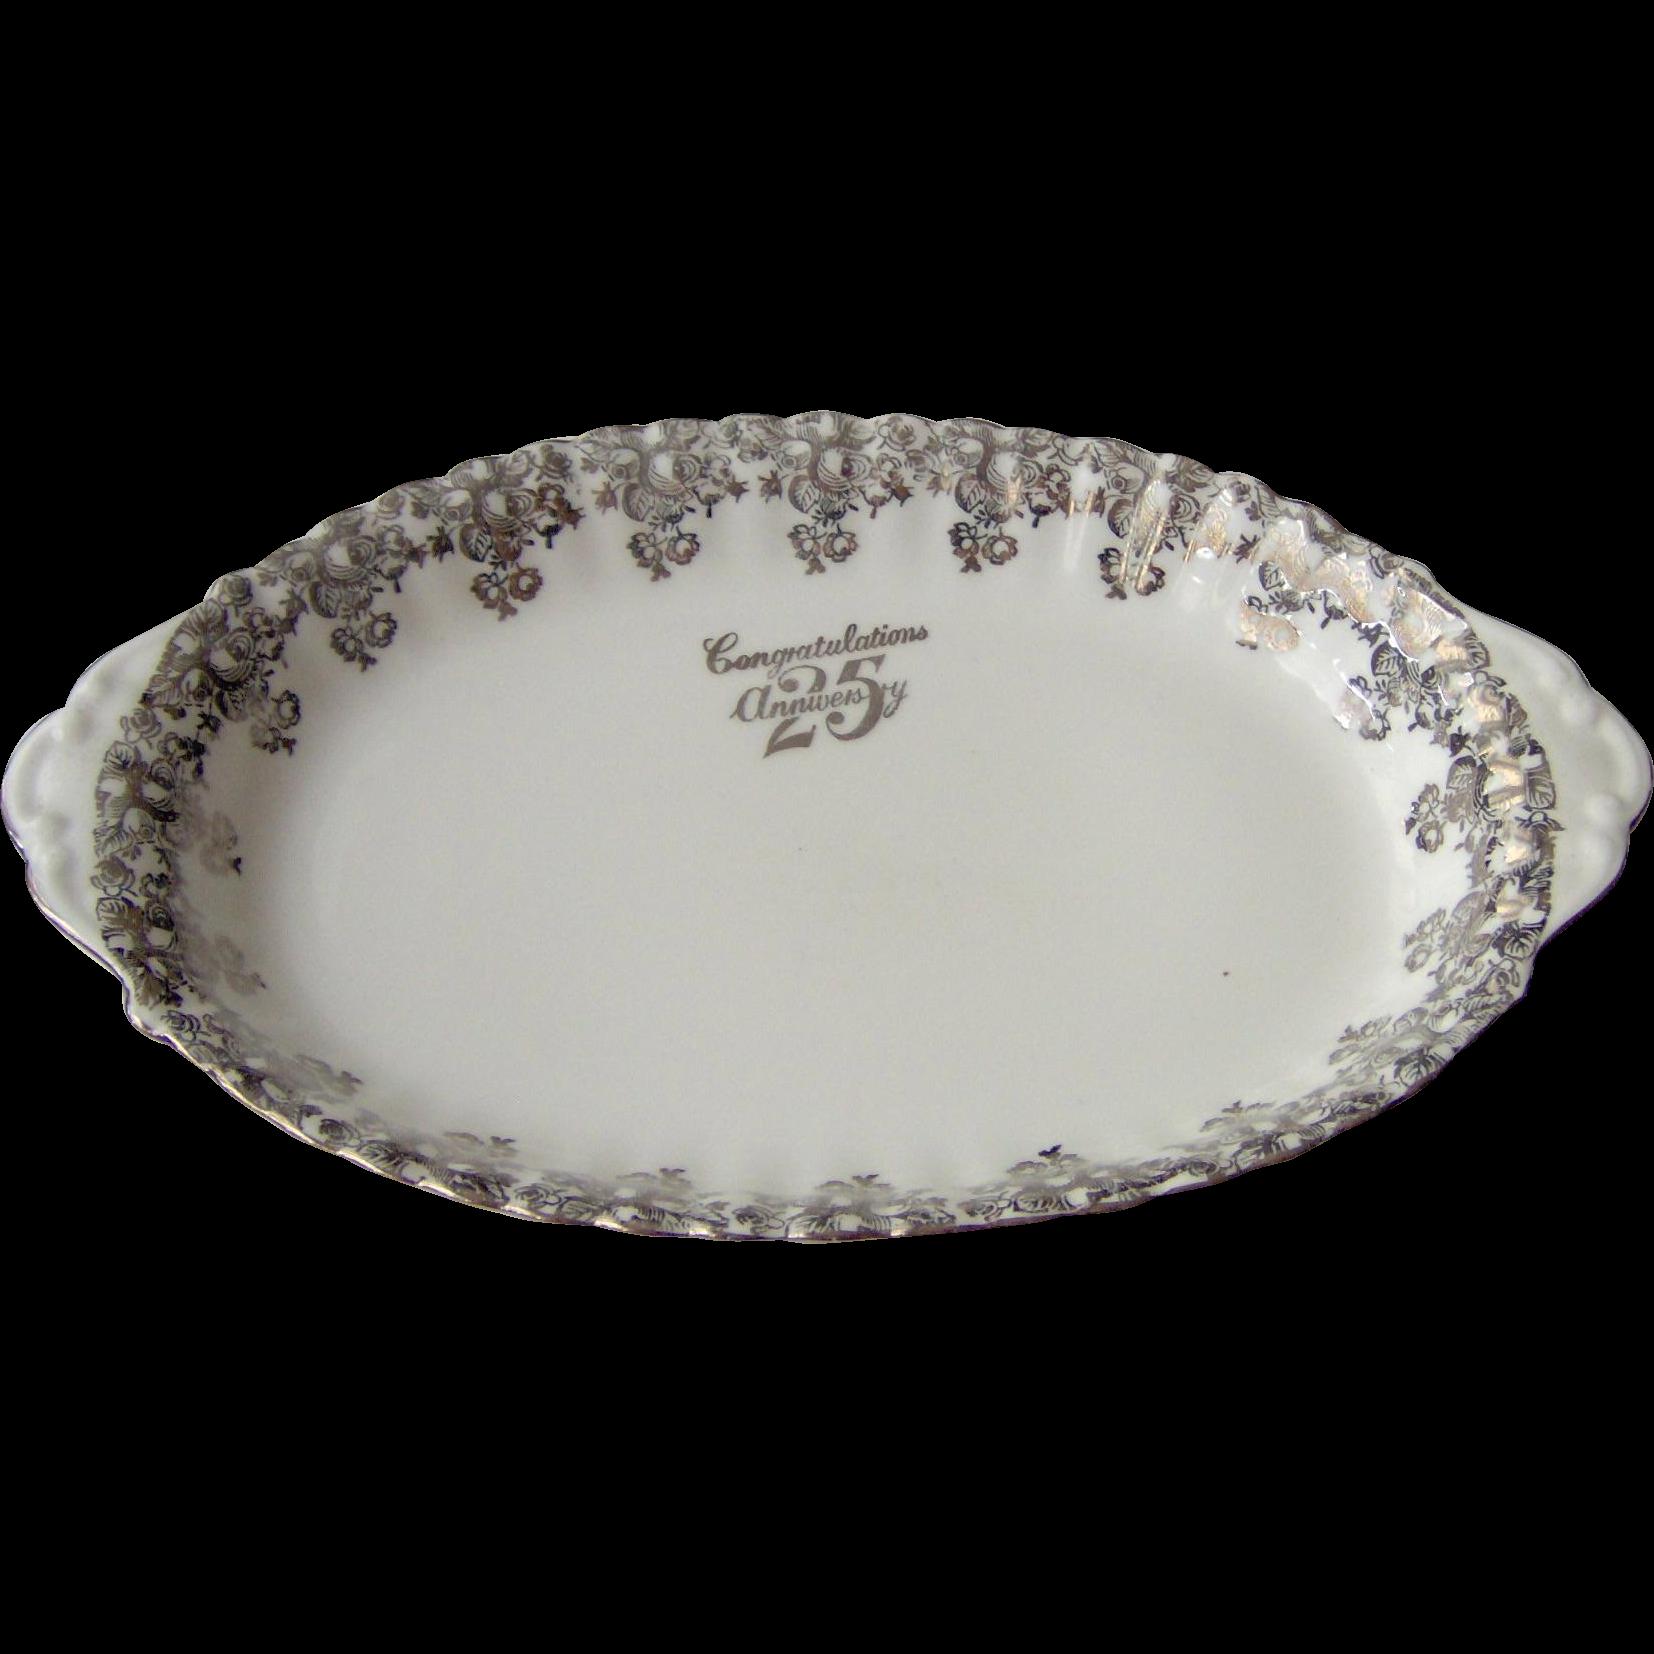 Vintage Royal Albert Tray or Serving Dish